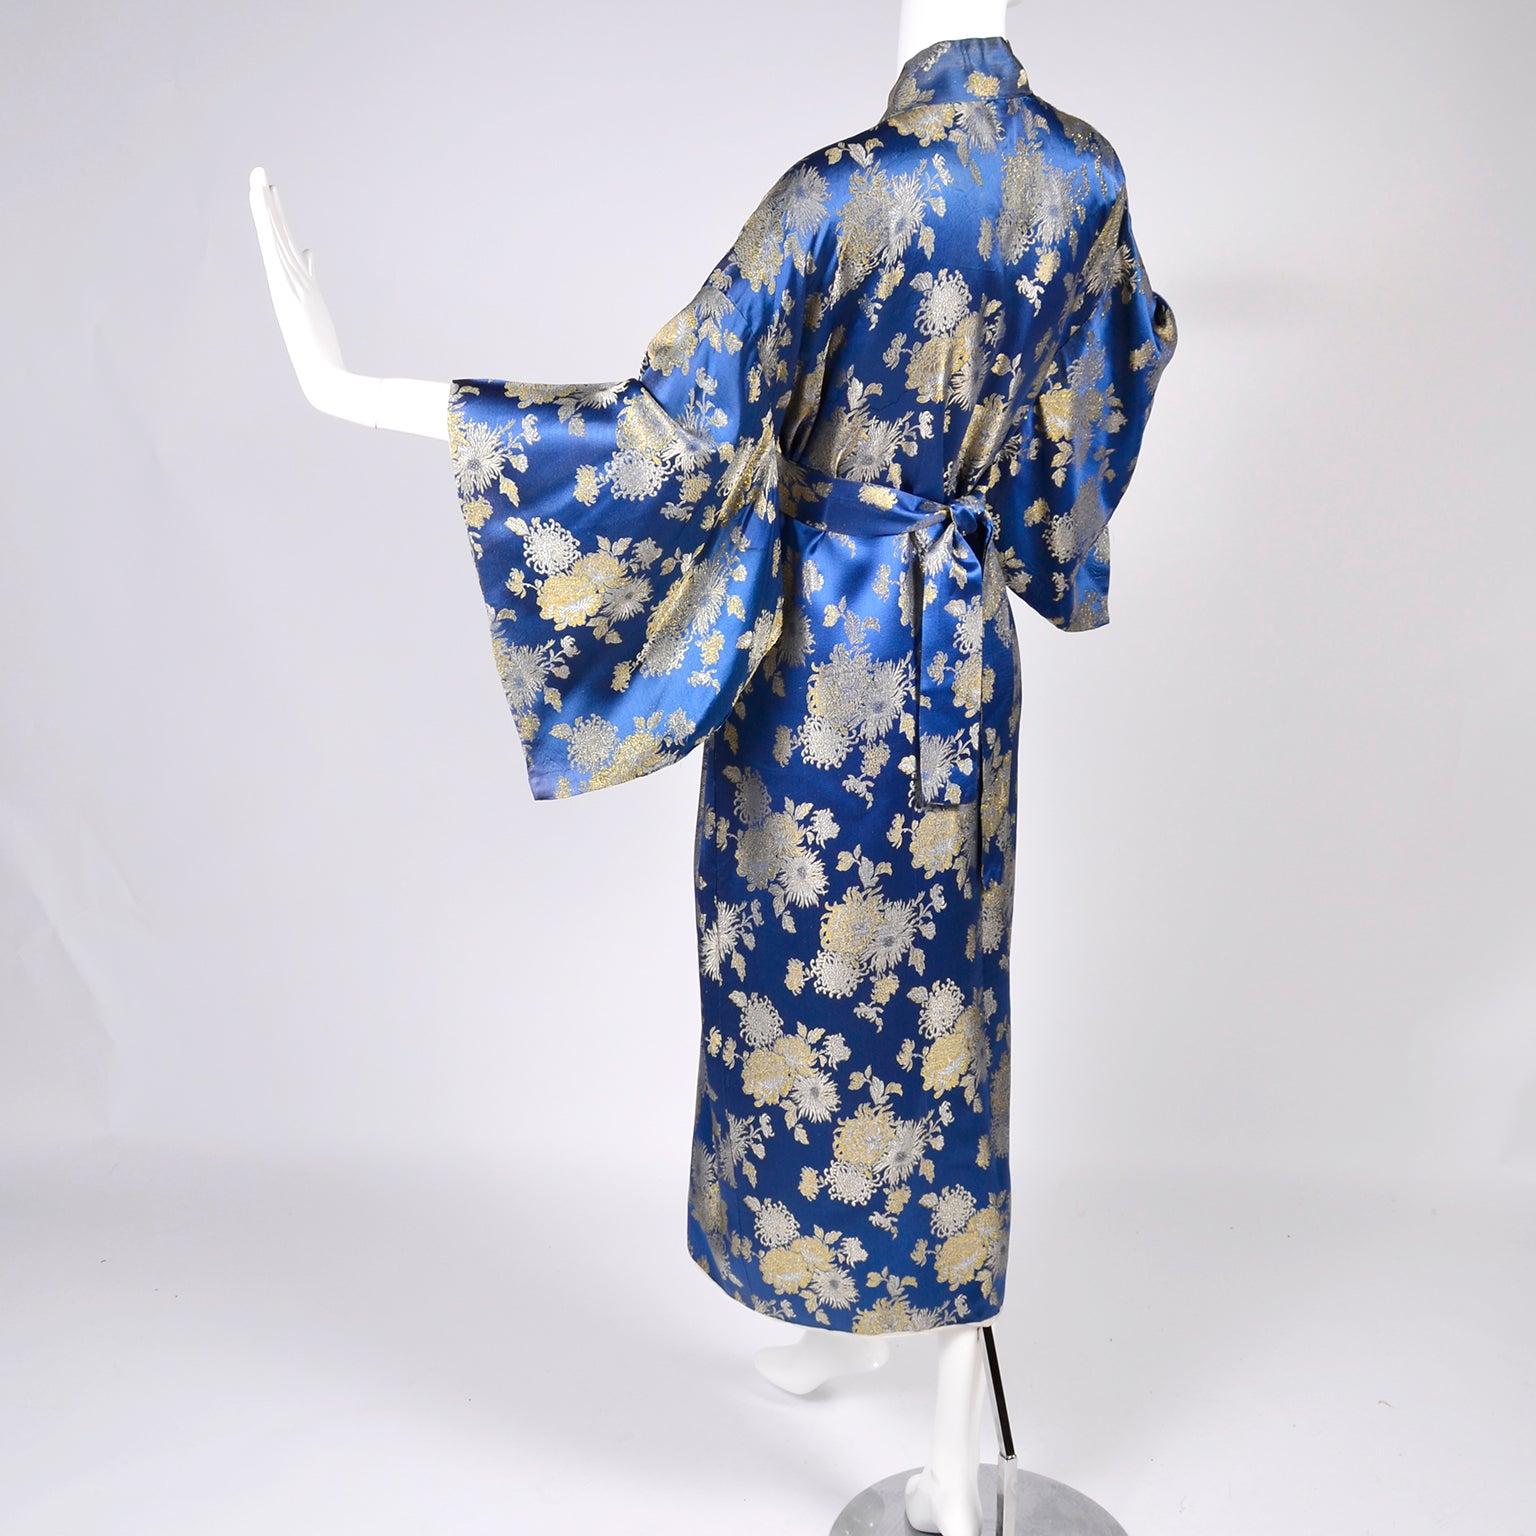 Japanese Vintage Kimono Robe in Blue Silk Gold Metallic chrysanthemum  Embroidery For Sale at 1stdibs 71ee5b262